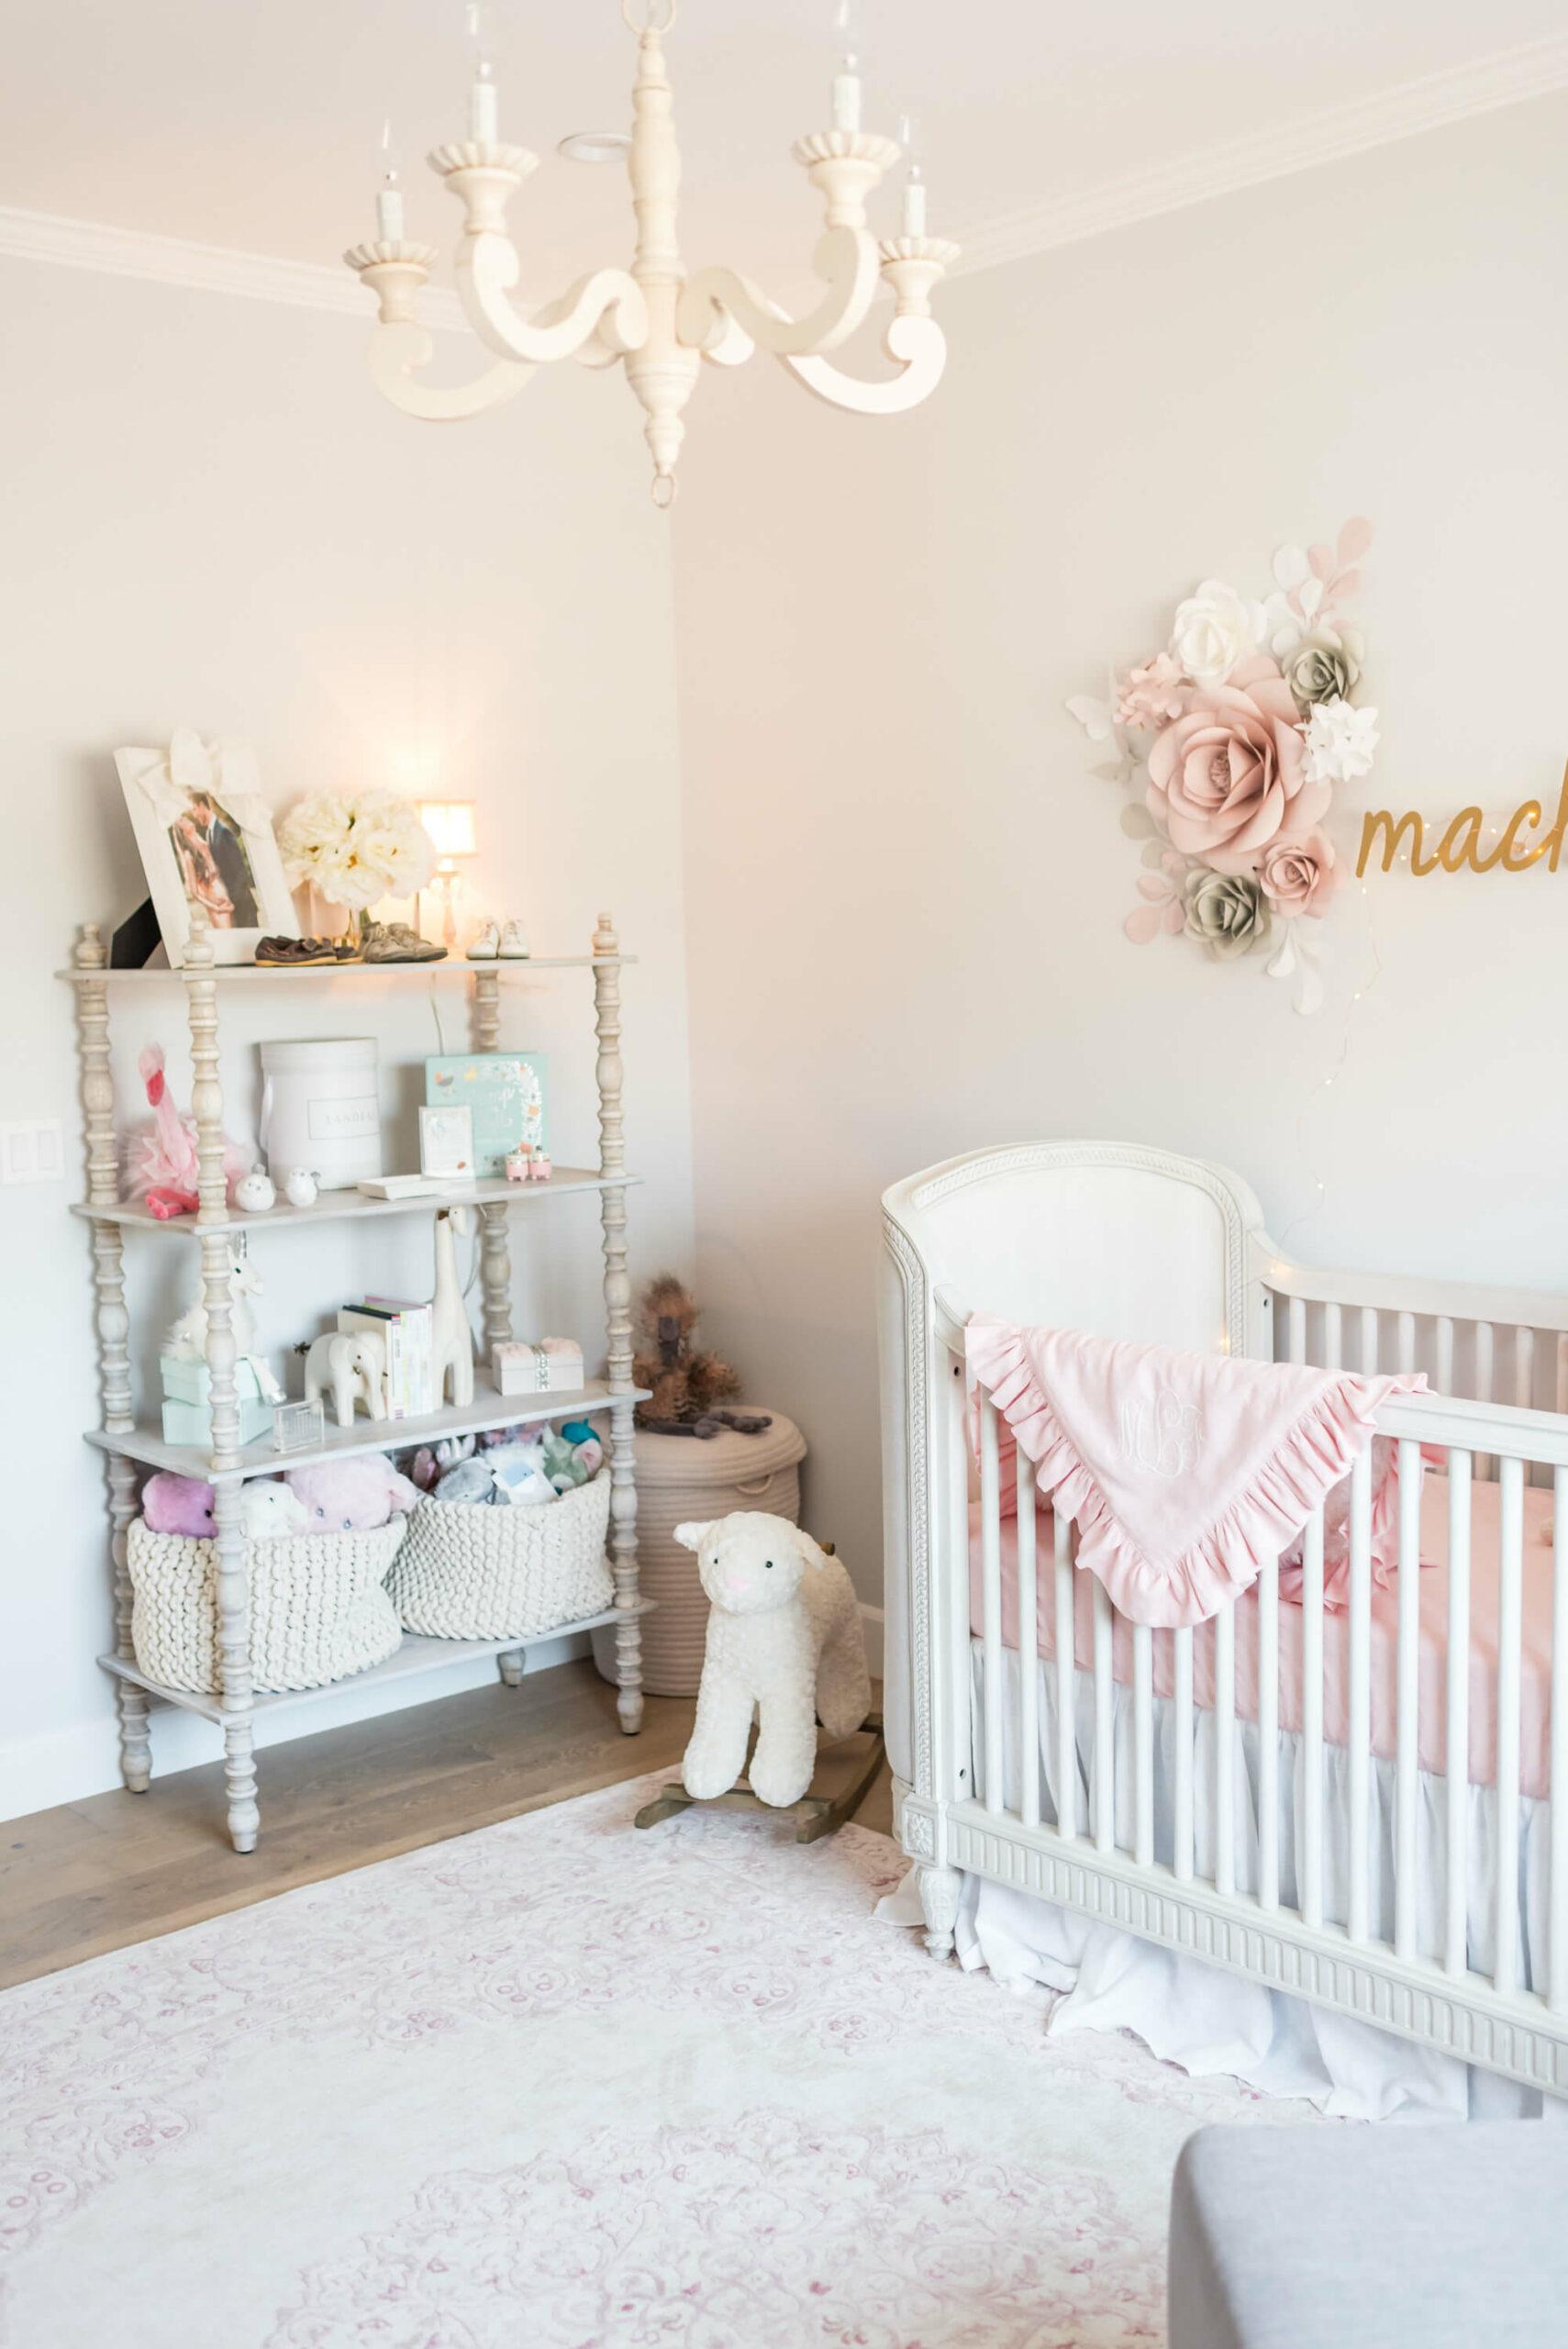 angela lanter hello gorgeous nursery furniture on sale